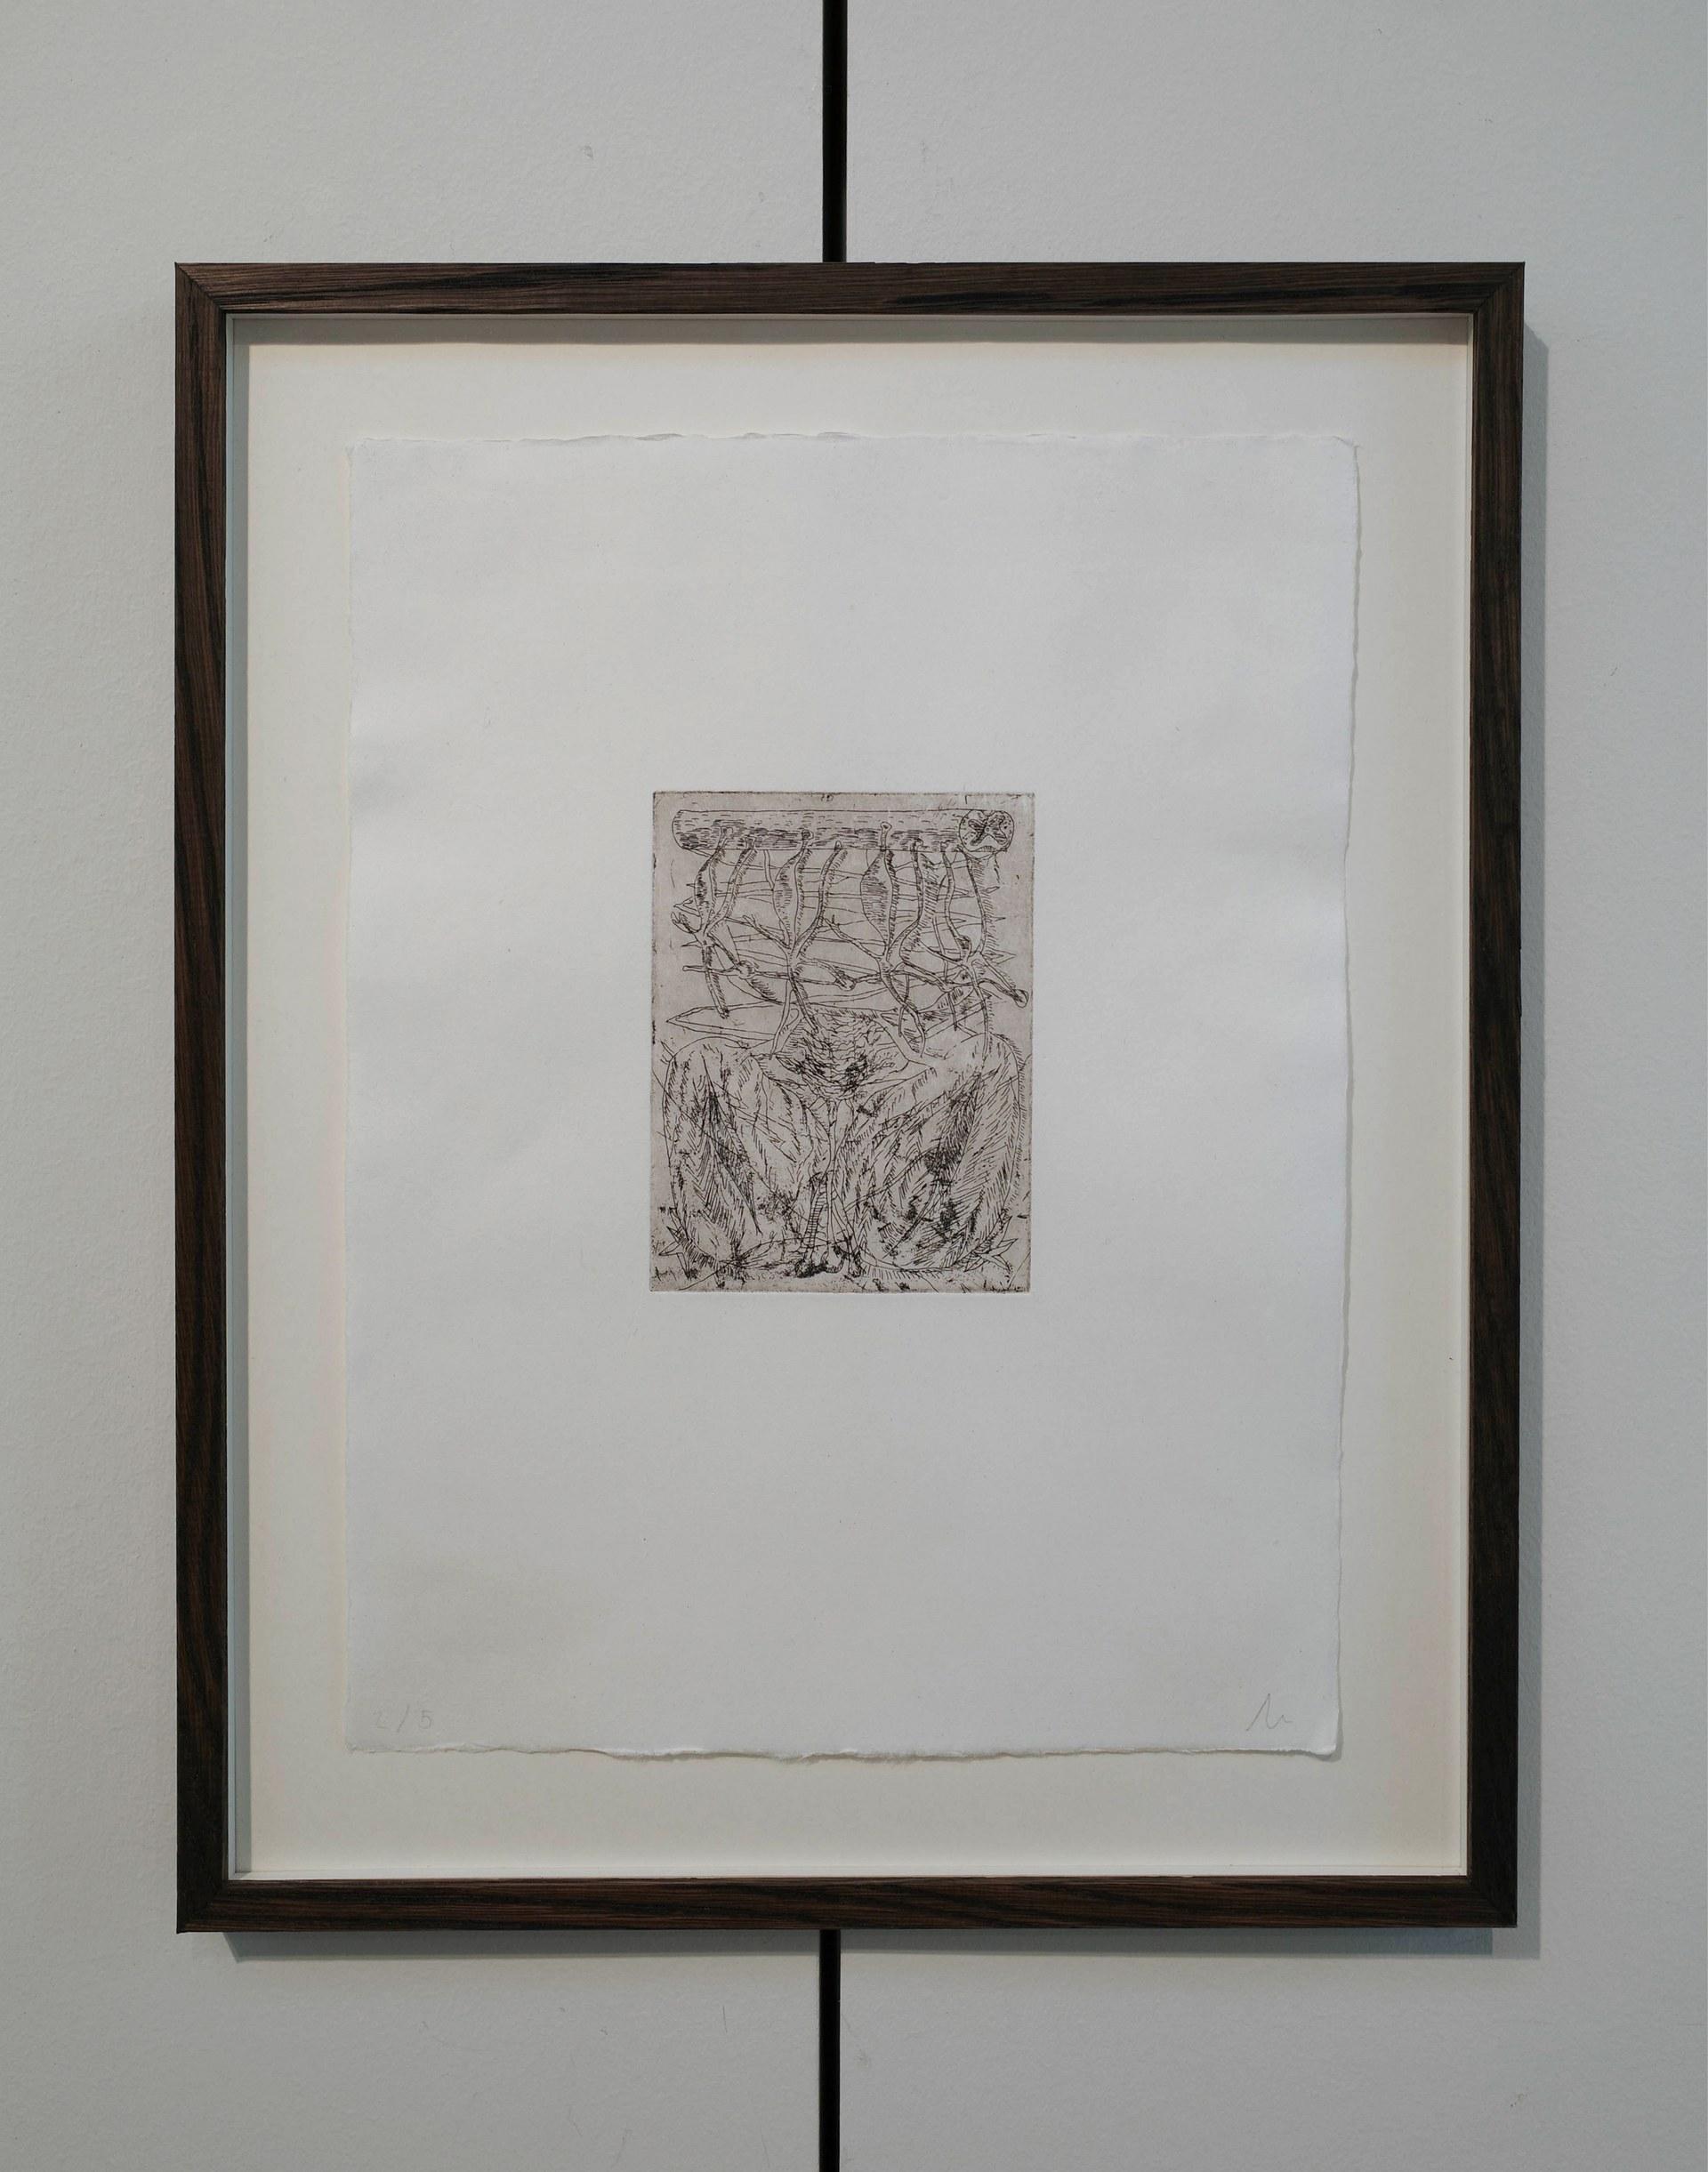 Detail of 'mennesket, amfibiet', etching on kozo paper